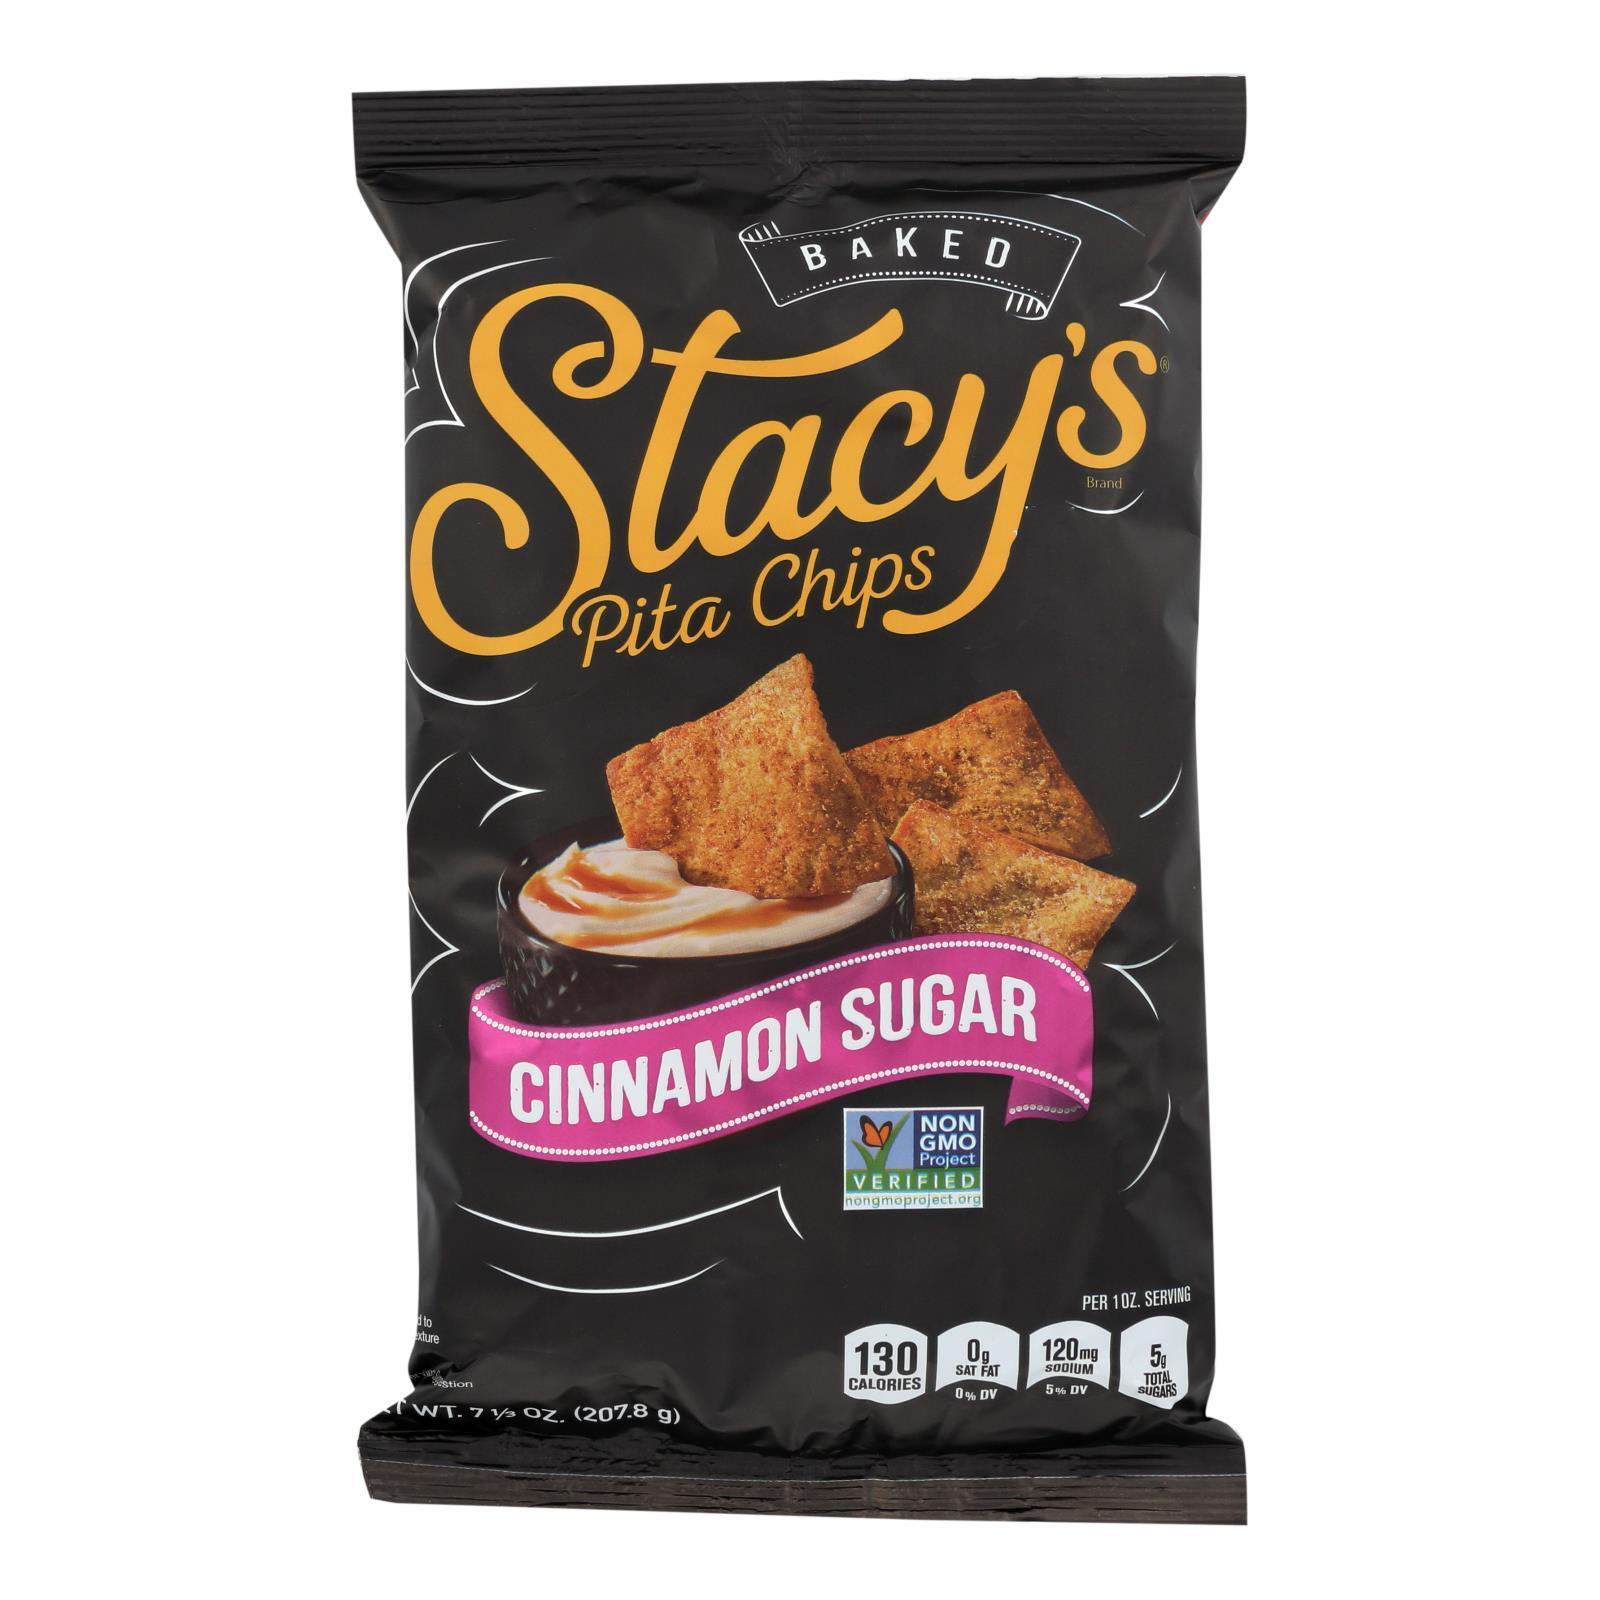 Stacy's Pita Chips Cinnamon Sugar Pita Chips - Cinnamon Sugar - Case of 12 - 7.33 oz.